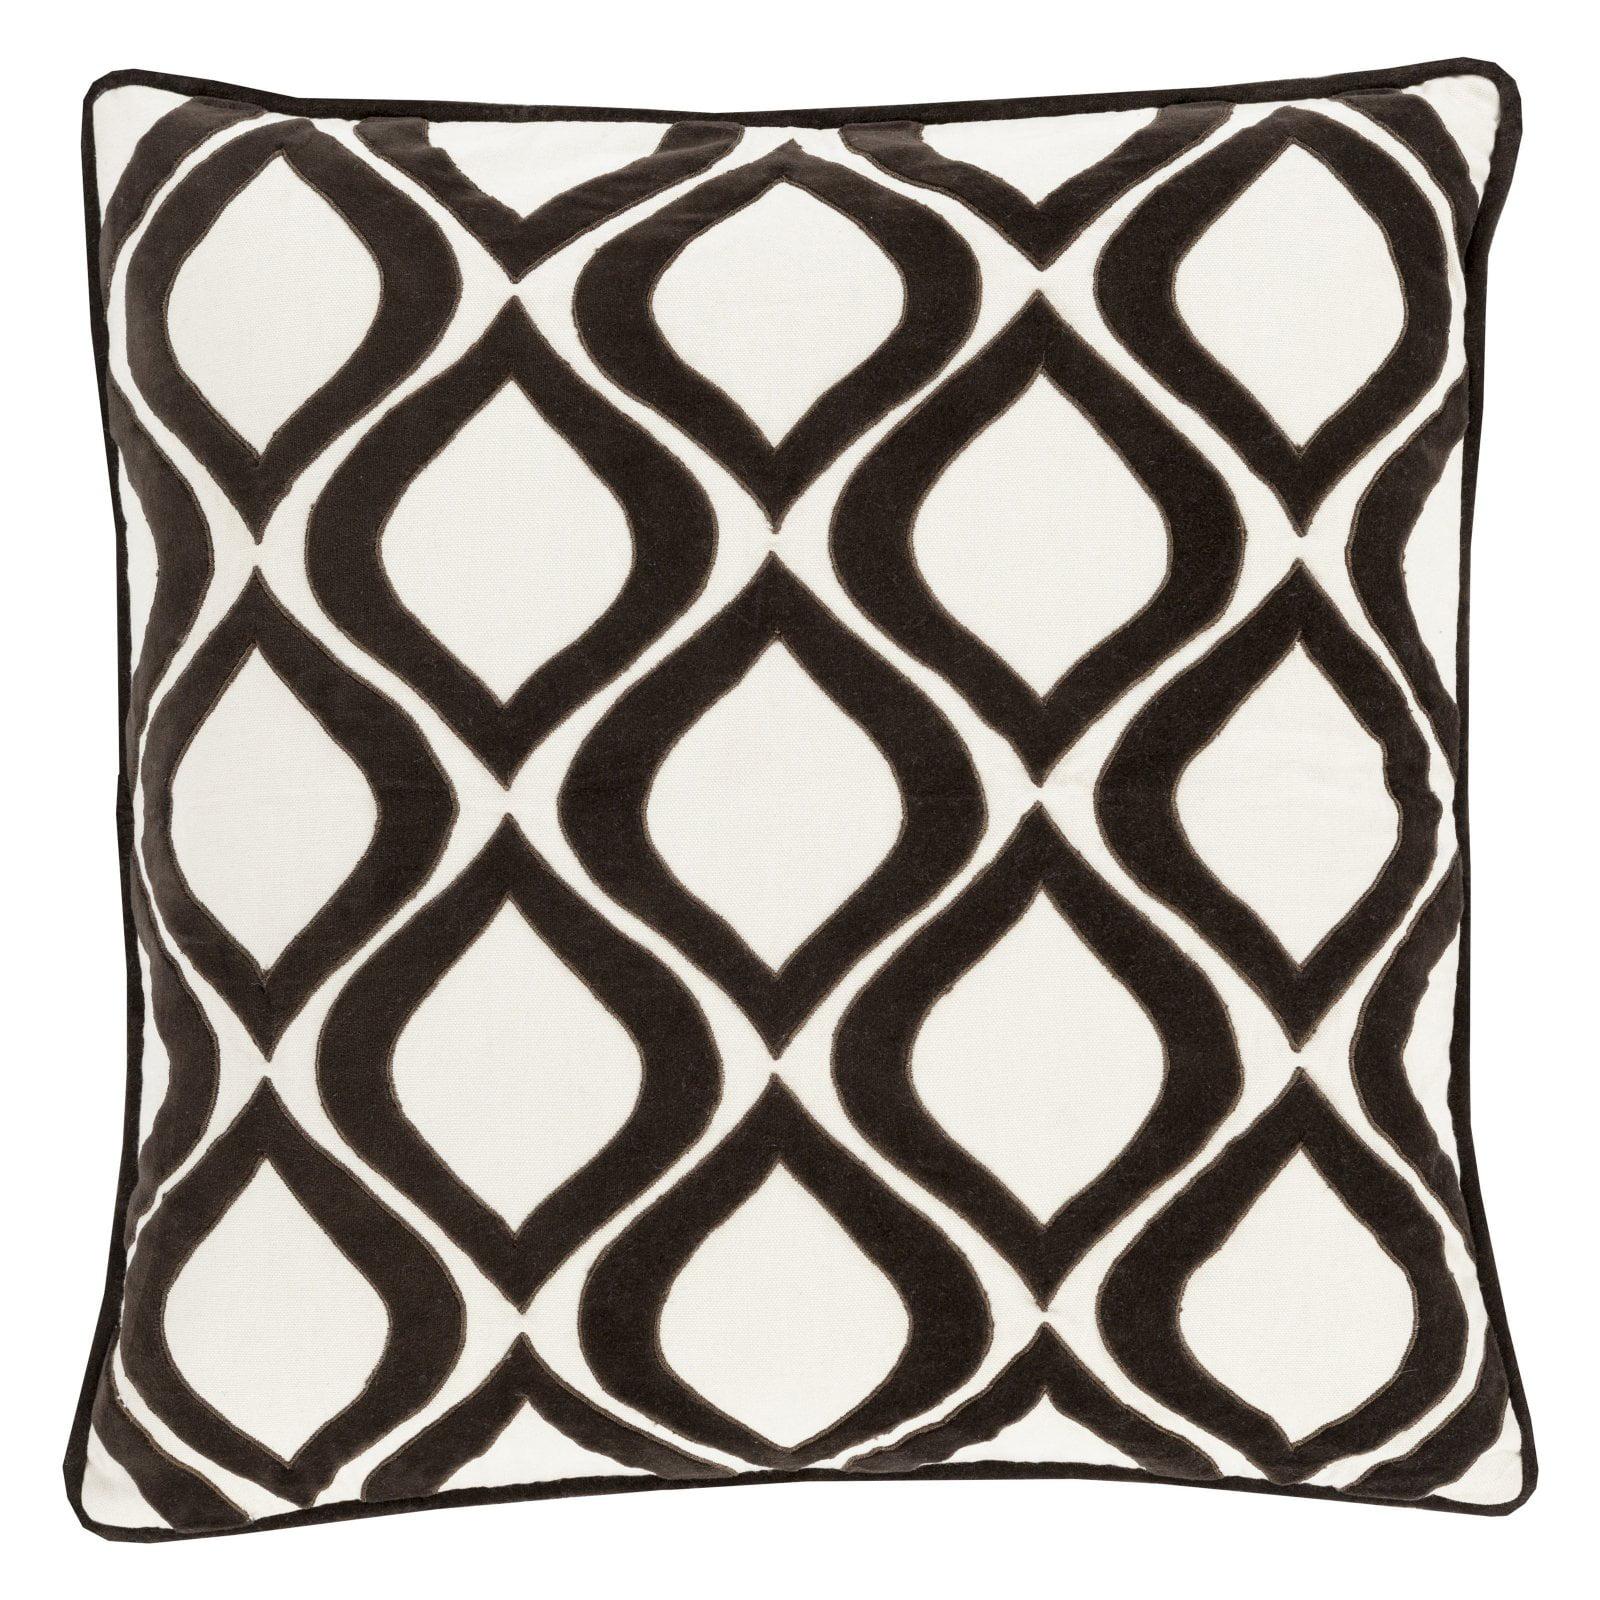 Surya Seraphina Decorative Throw Pillow